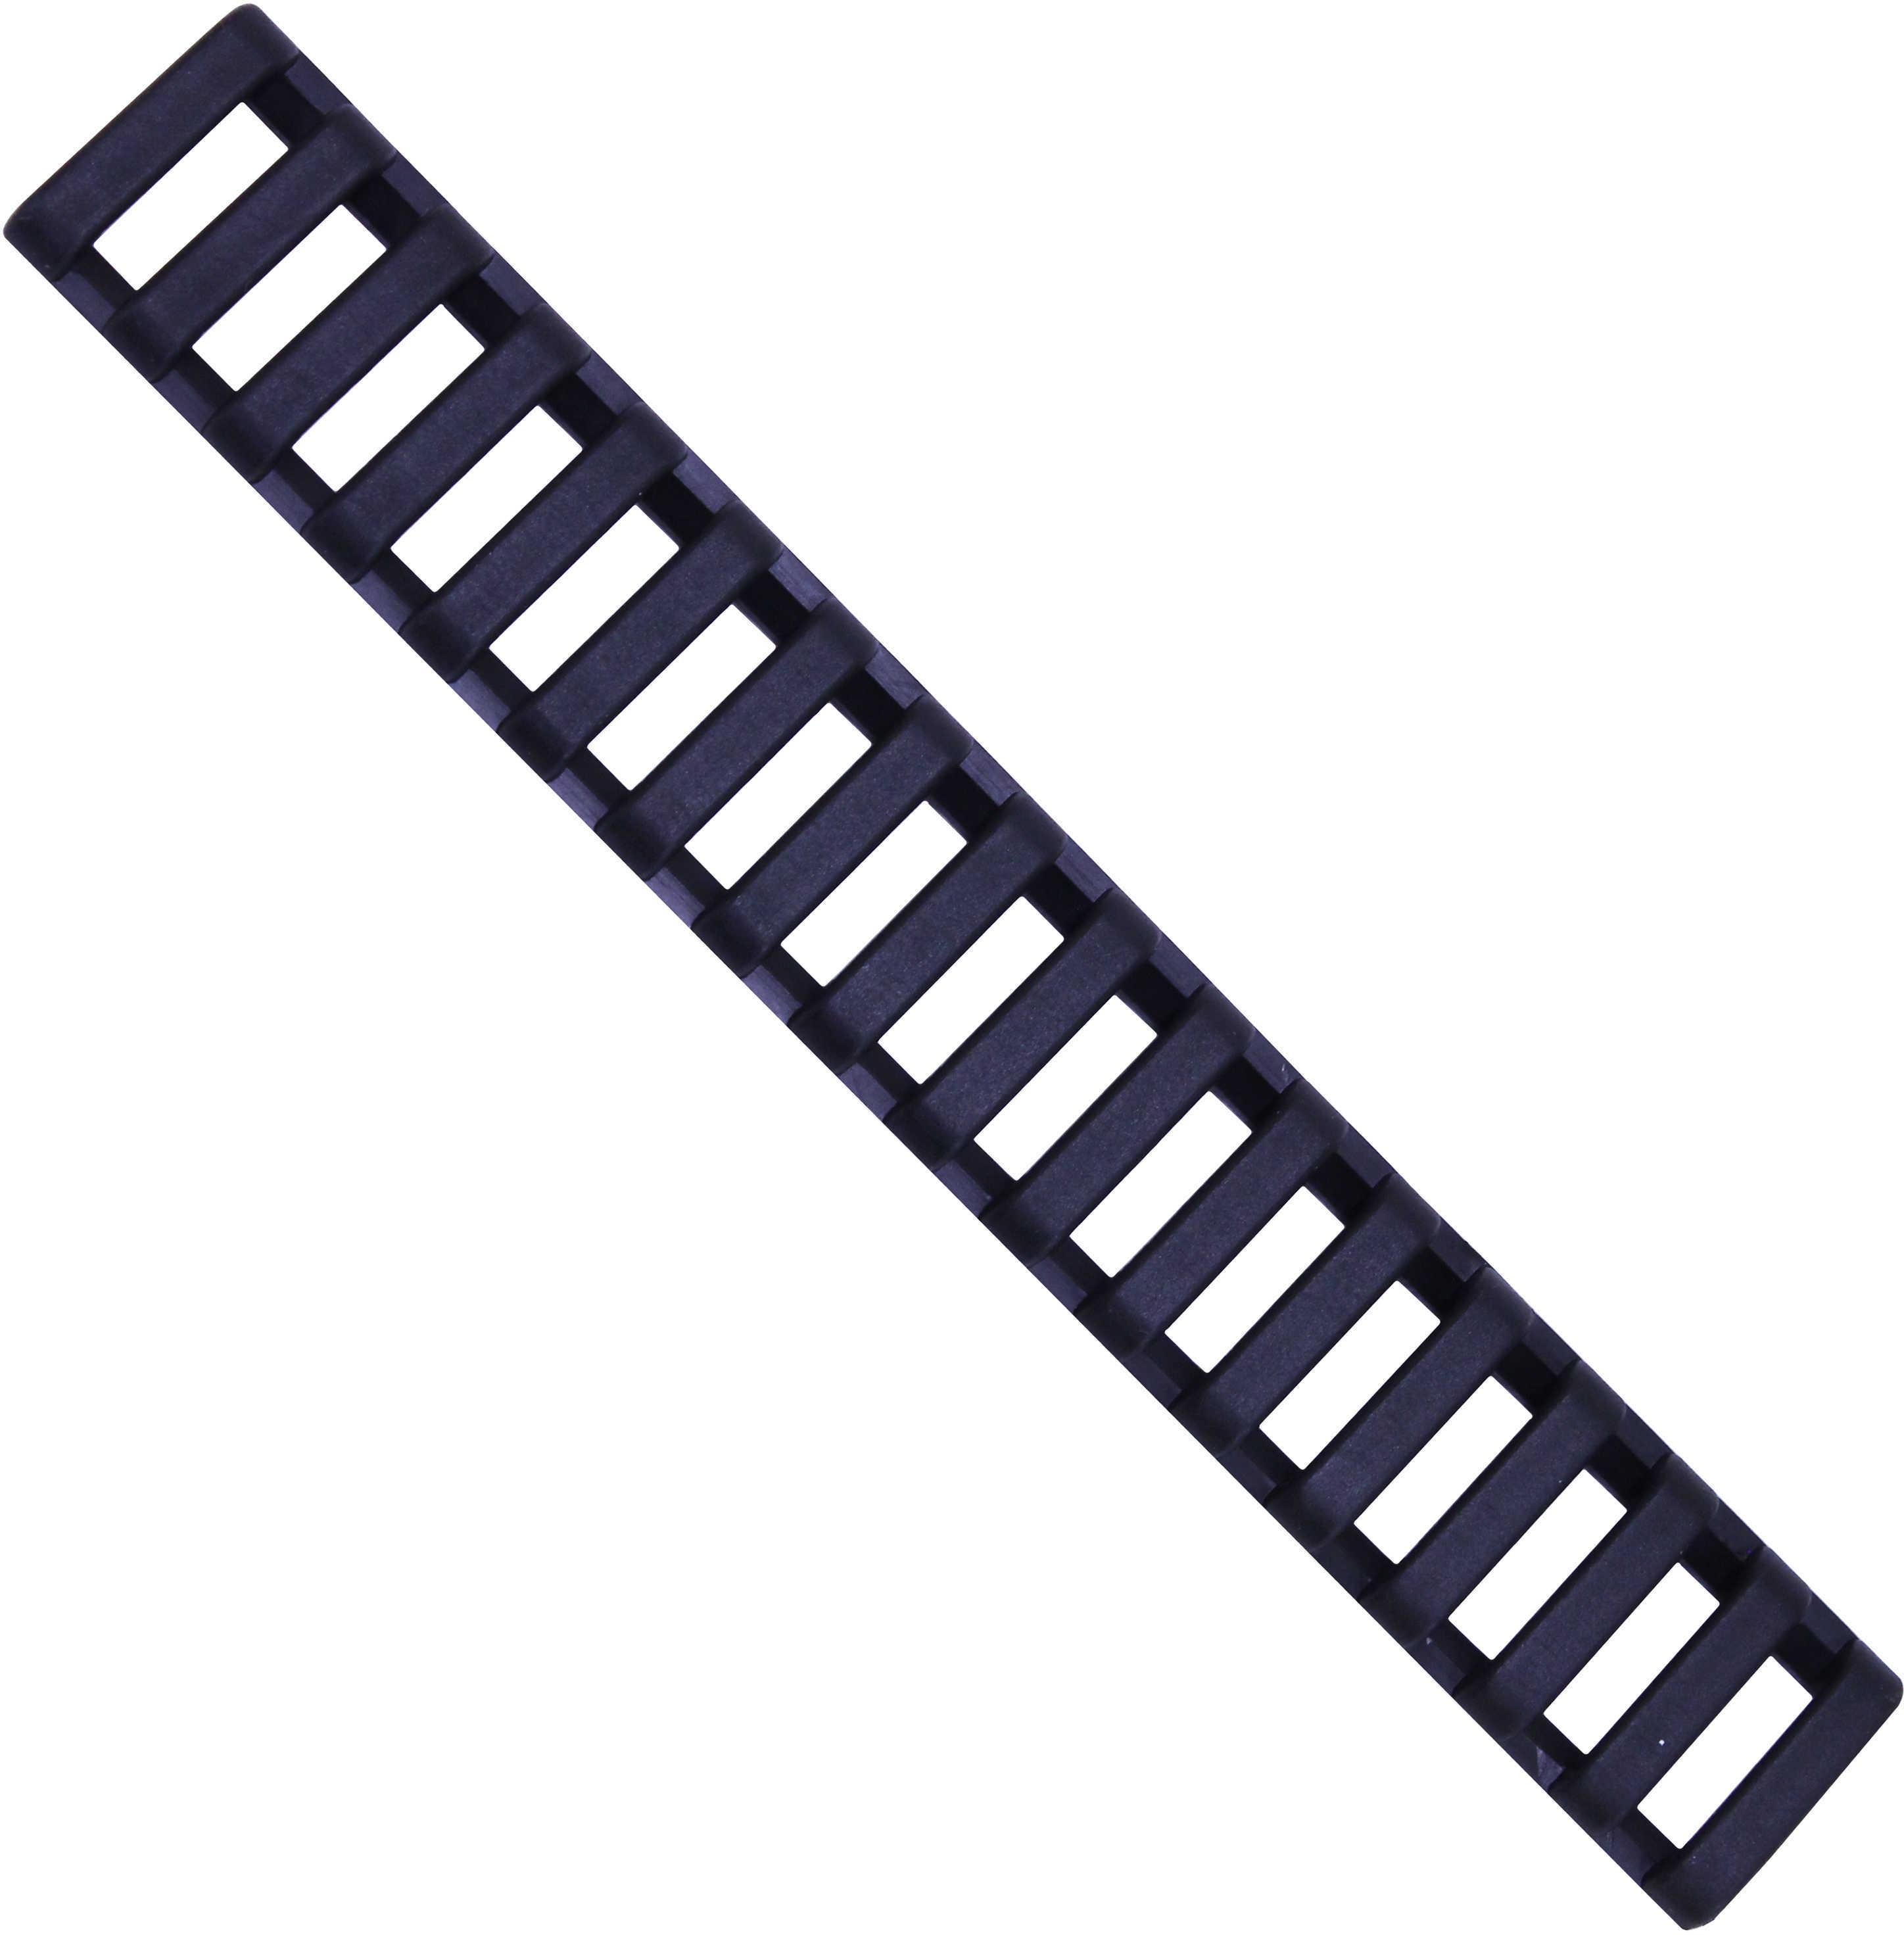 Ergo Ext Rail Length Protector Accessory Black Rail Covers 18 Slot Ladder 4373-3PKBK